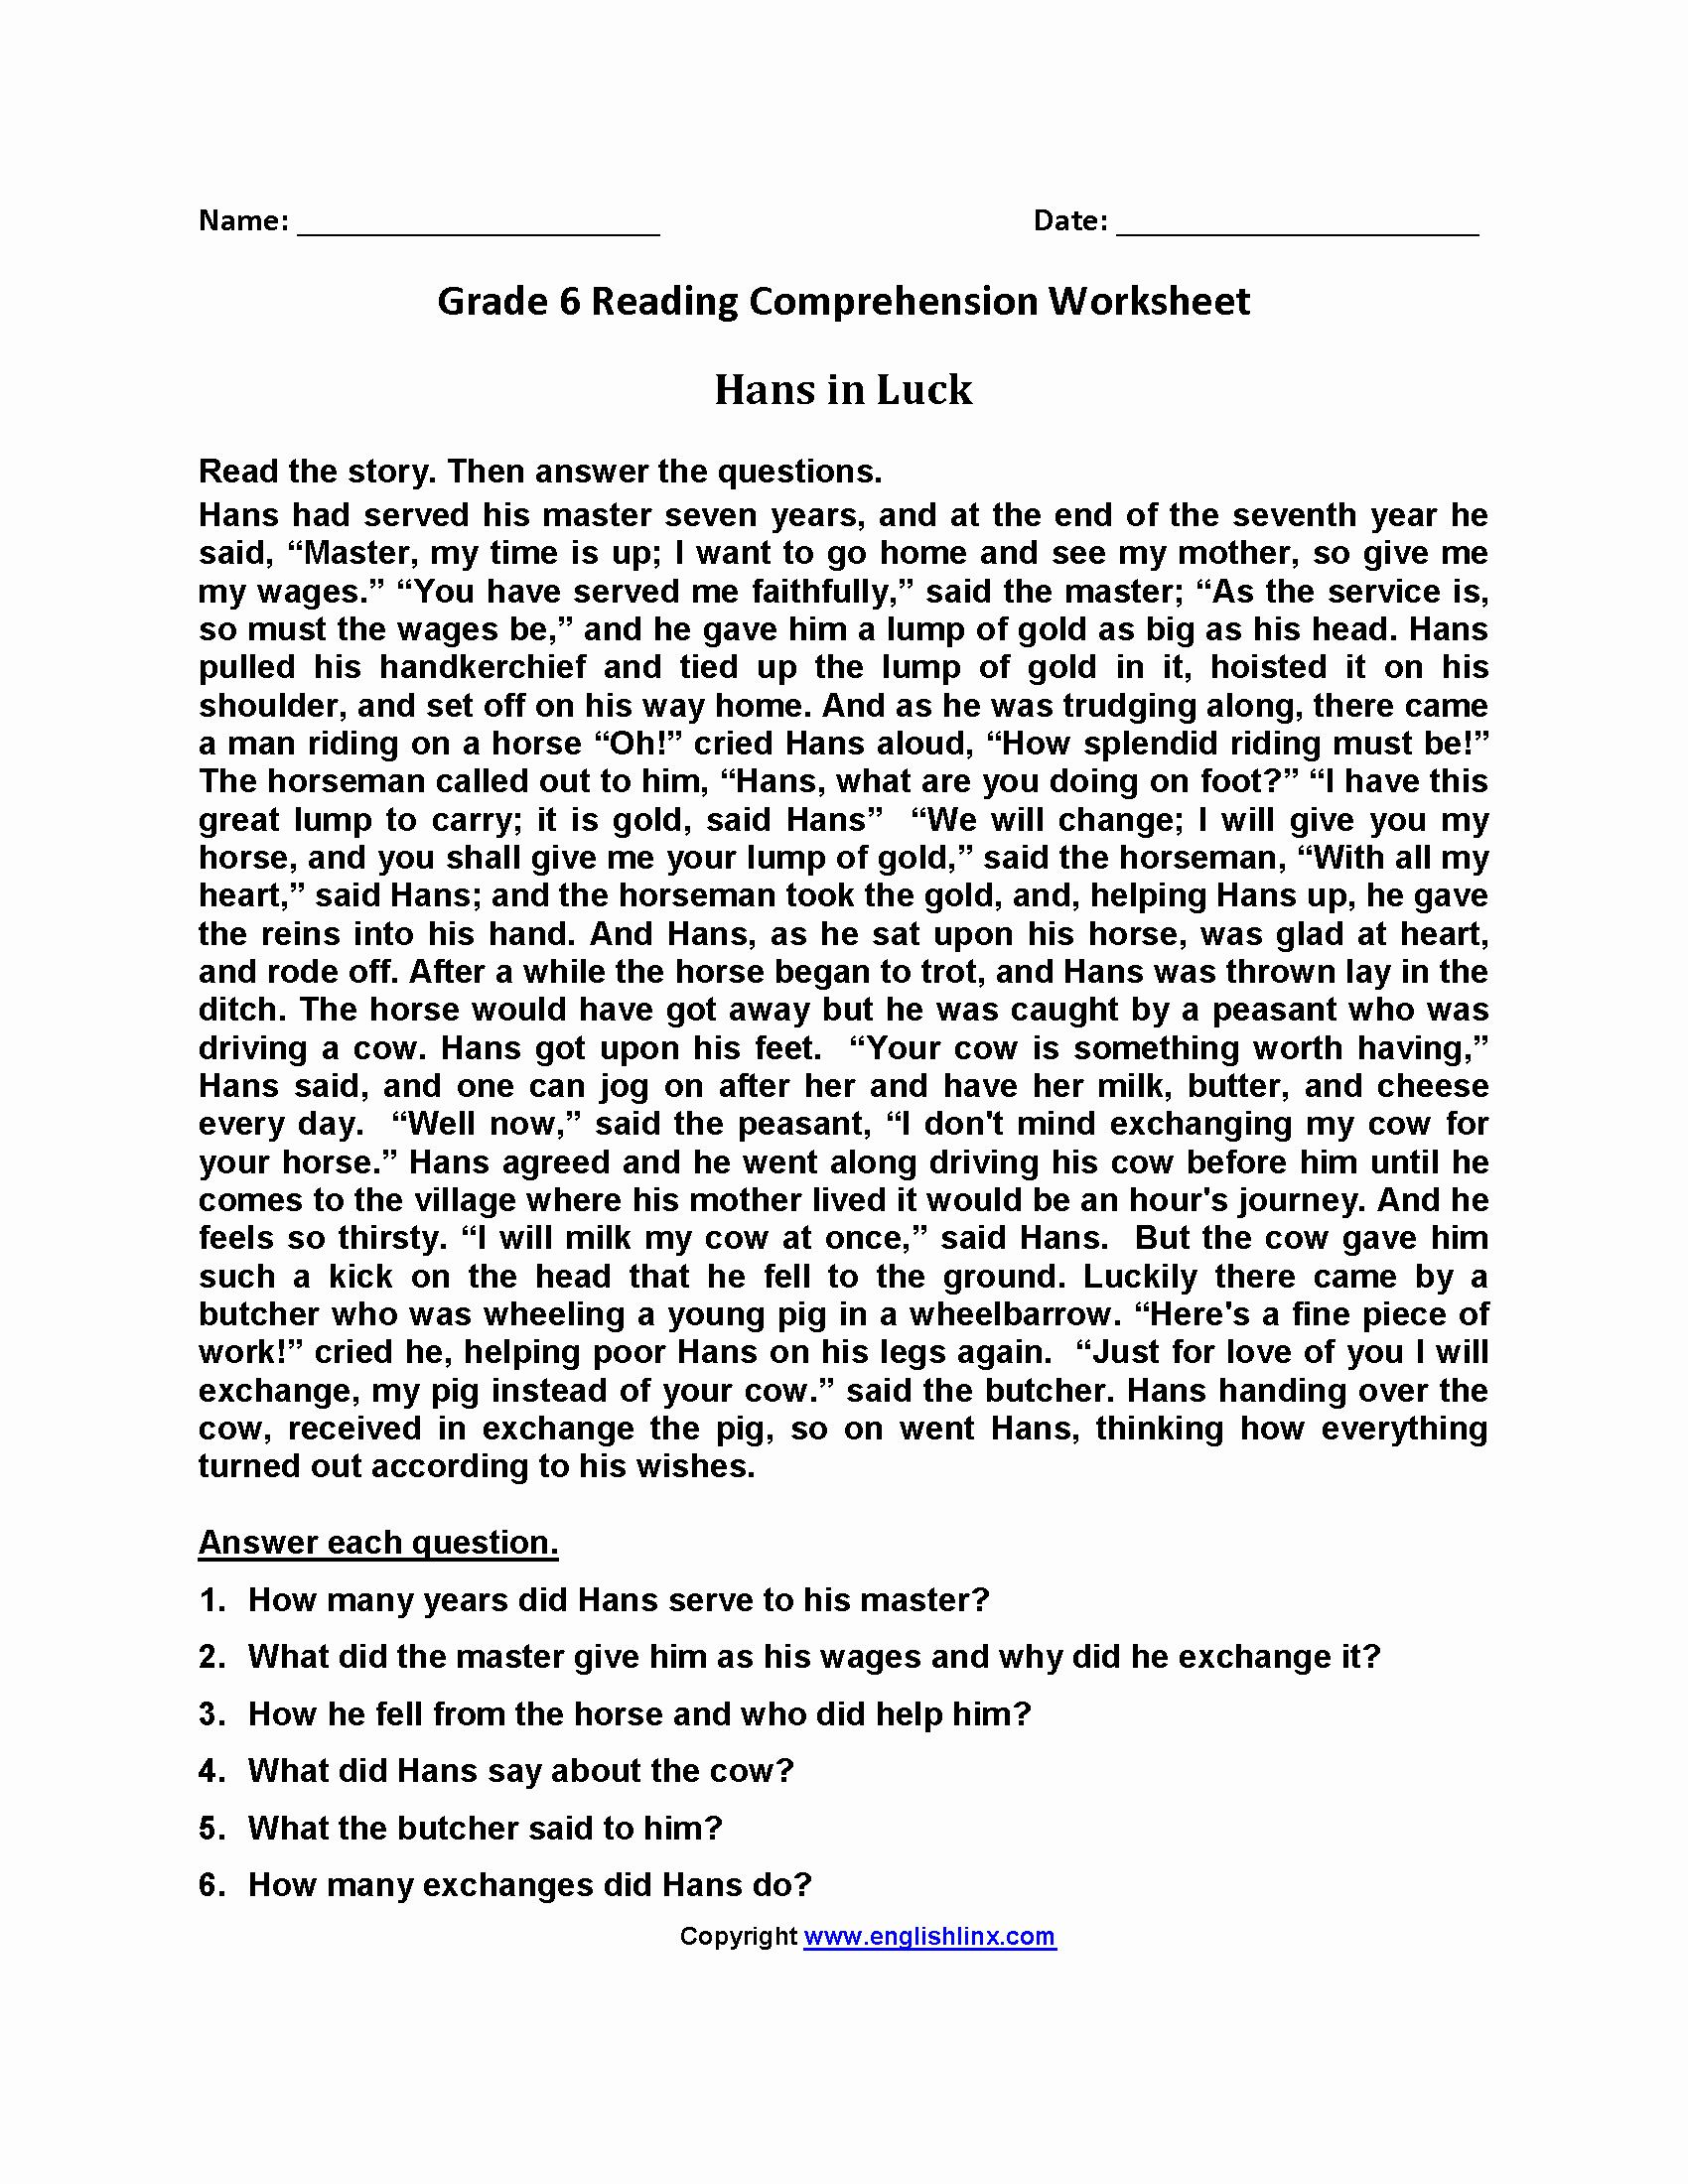 20 Free Printable Reading Comprehension Worksheets For 6Th Grade | Free Printable Reading Comprehension Worksheets Grade 5